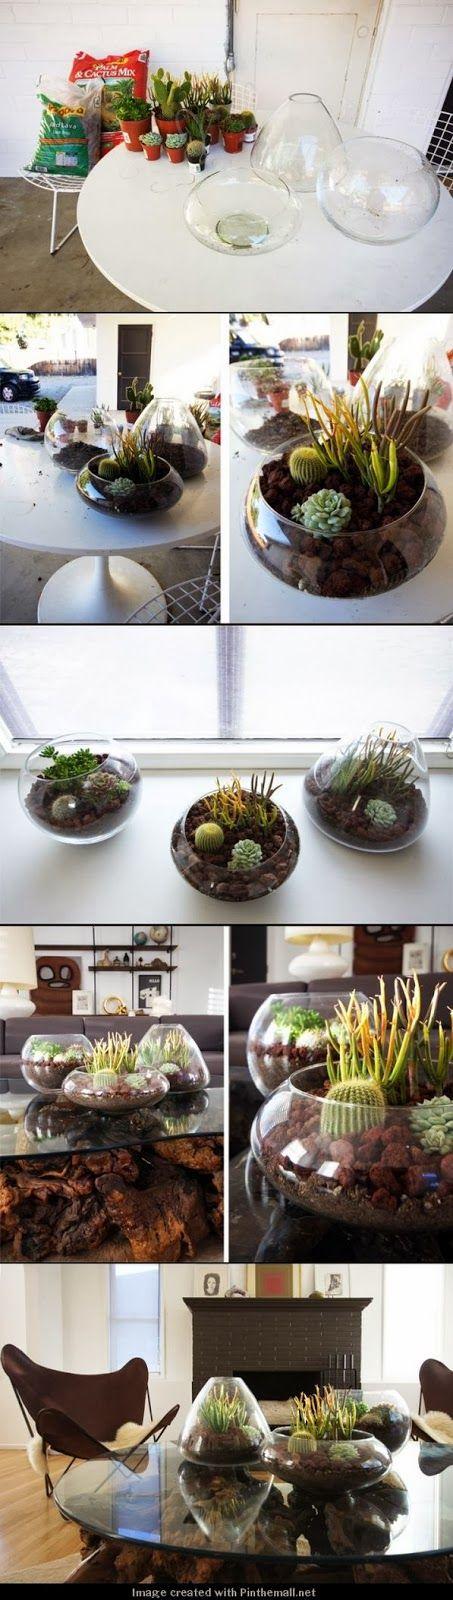 DIY Terrarium. I want to do this!